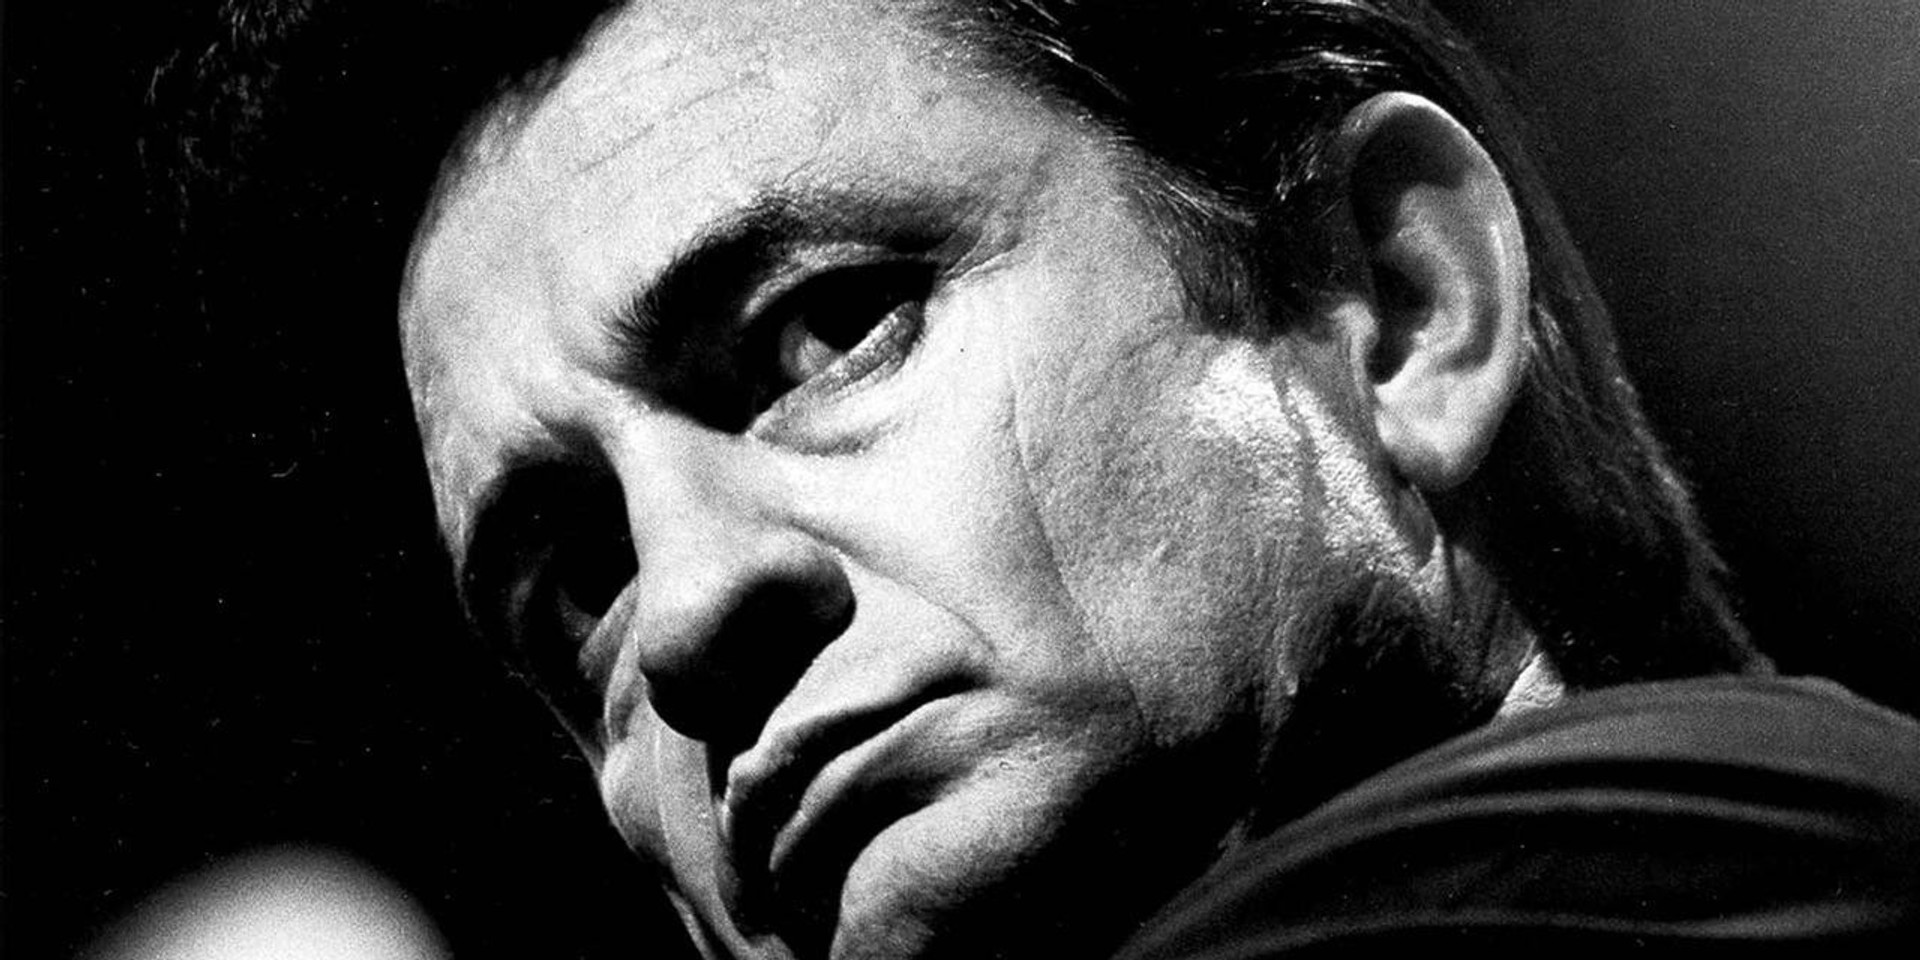 Essentials: Johnny Cash's At Folsom Prison (1968)